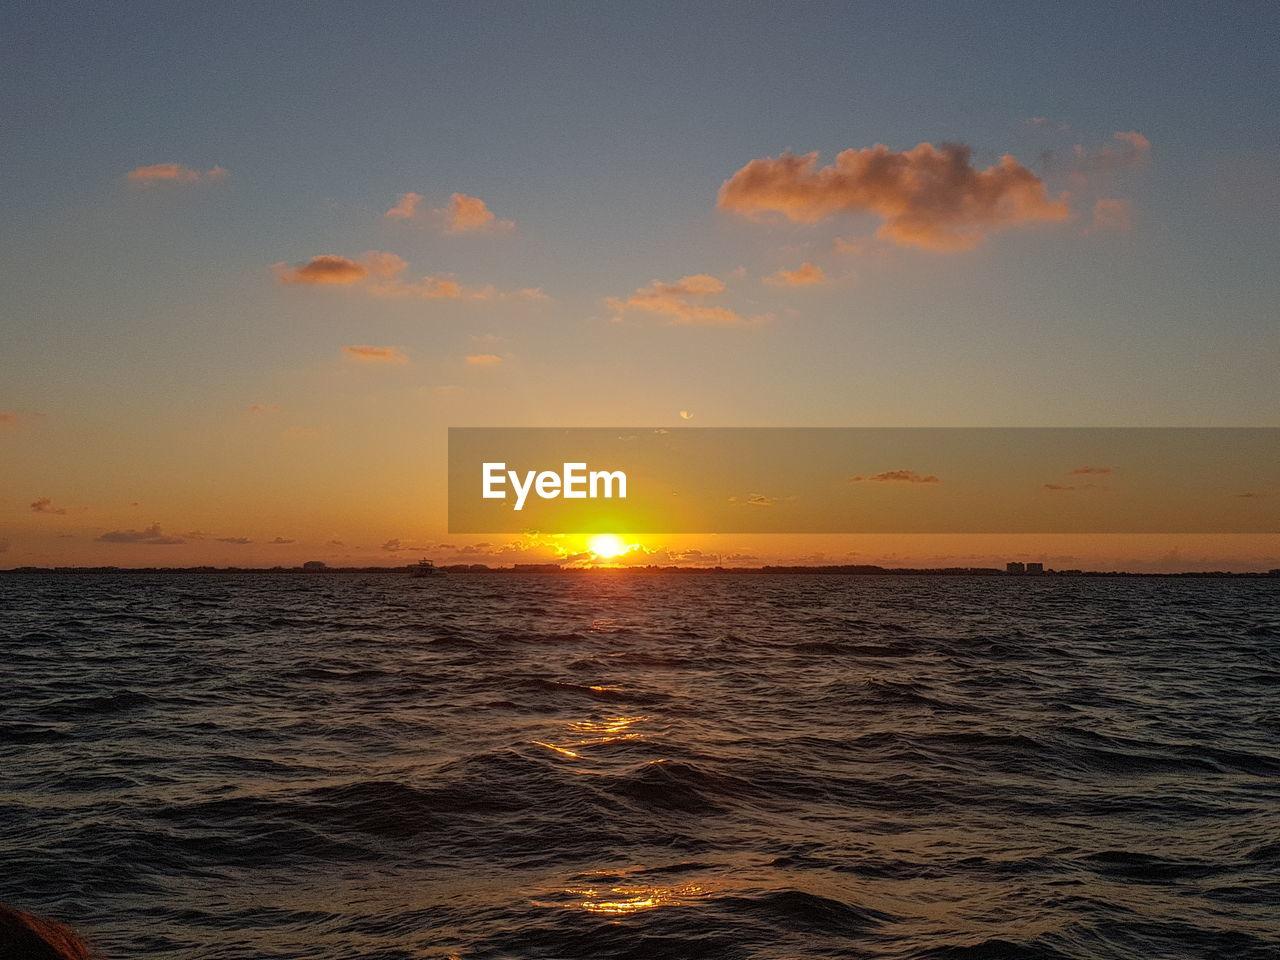 sunset, sky, water, sea, beauty in nature, scenics - nature, tranquility, orange color, tranquil scene, sun, horizon, horizon over water, idyllic, nature, cloud - sky, non-urban scene, no people, waterfront, sunlight, outdoors